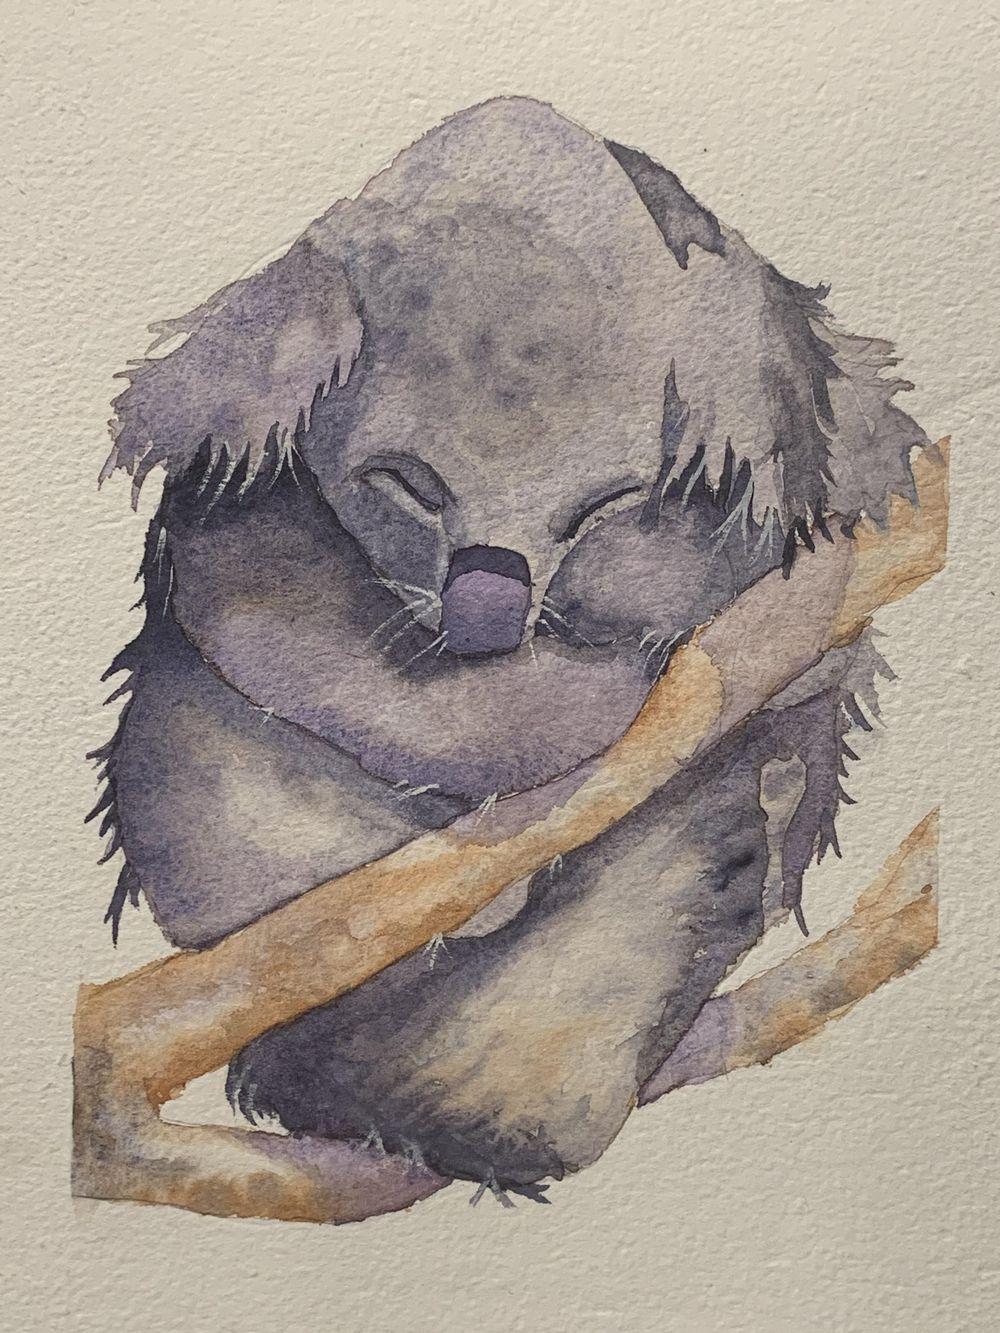 Koala - image 1 - student project